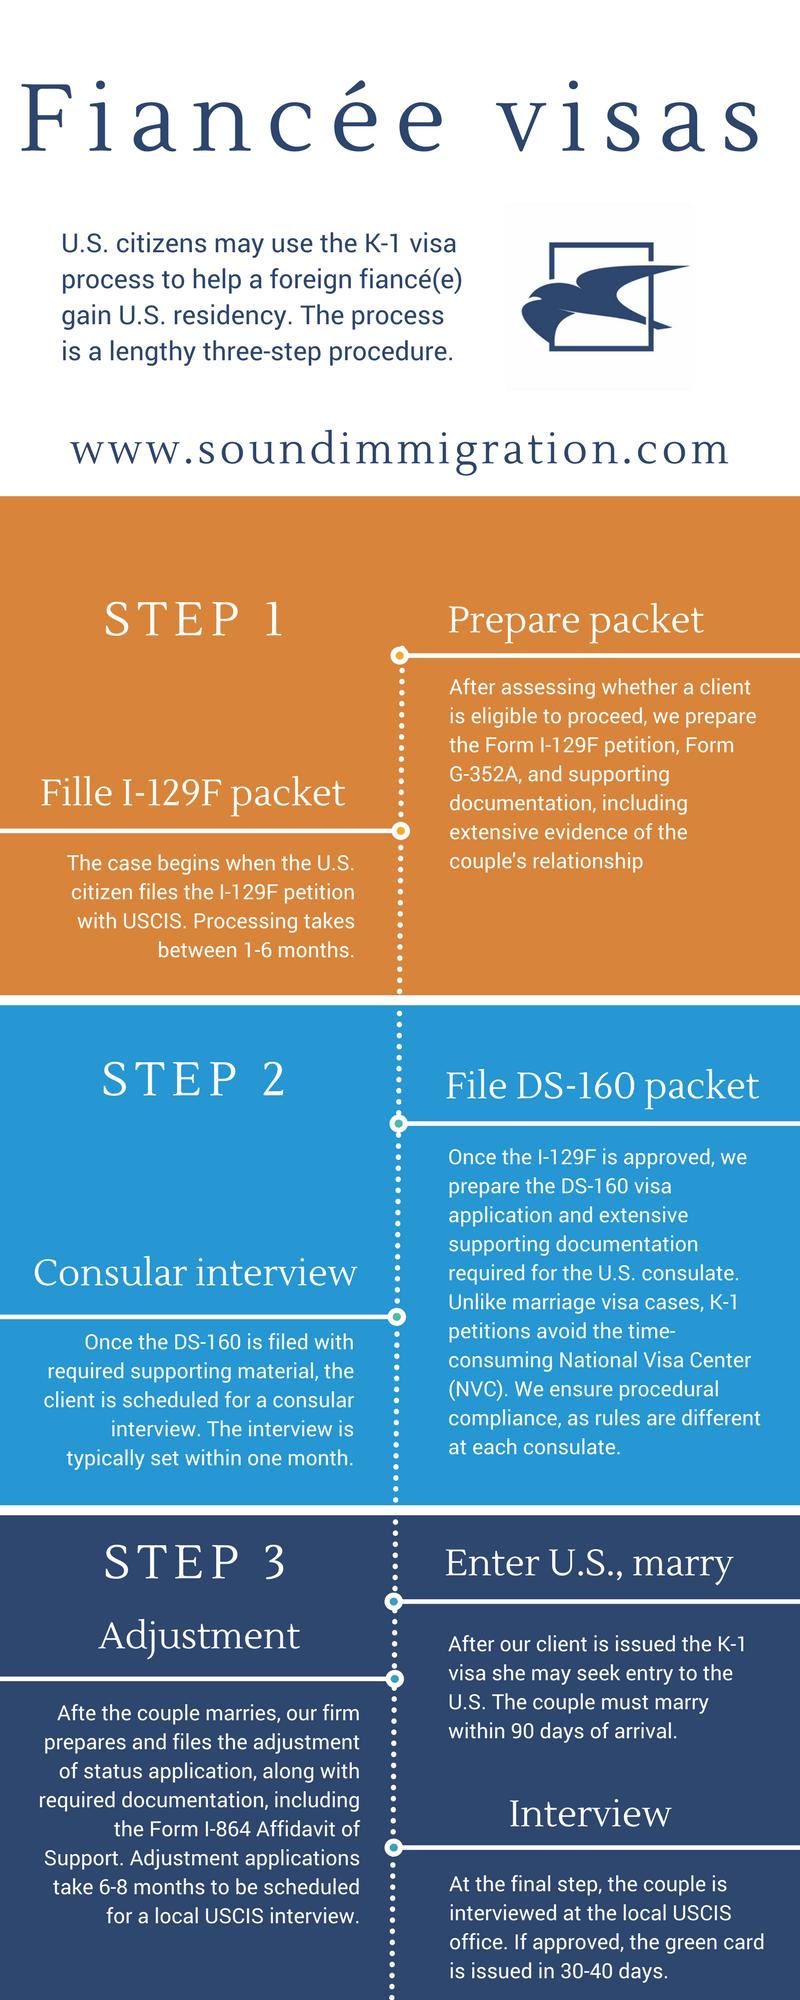 Understanding the fiance visa - k1 visa